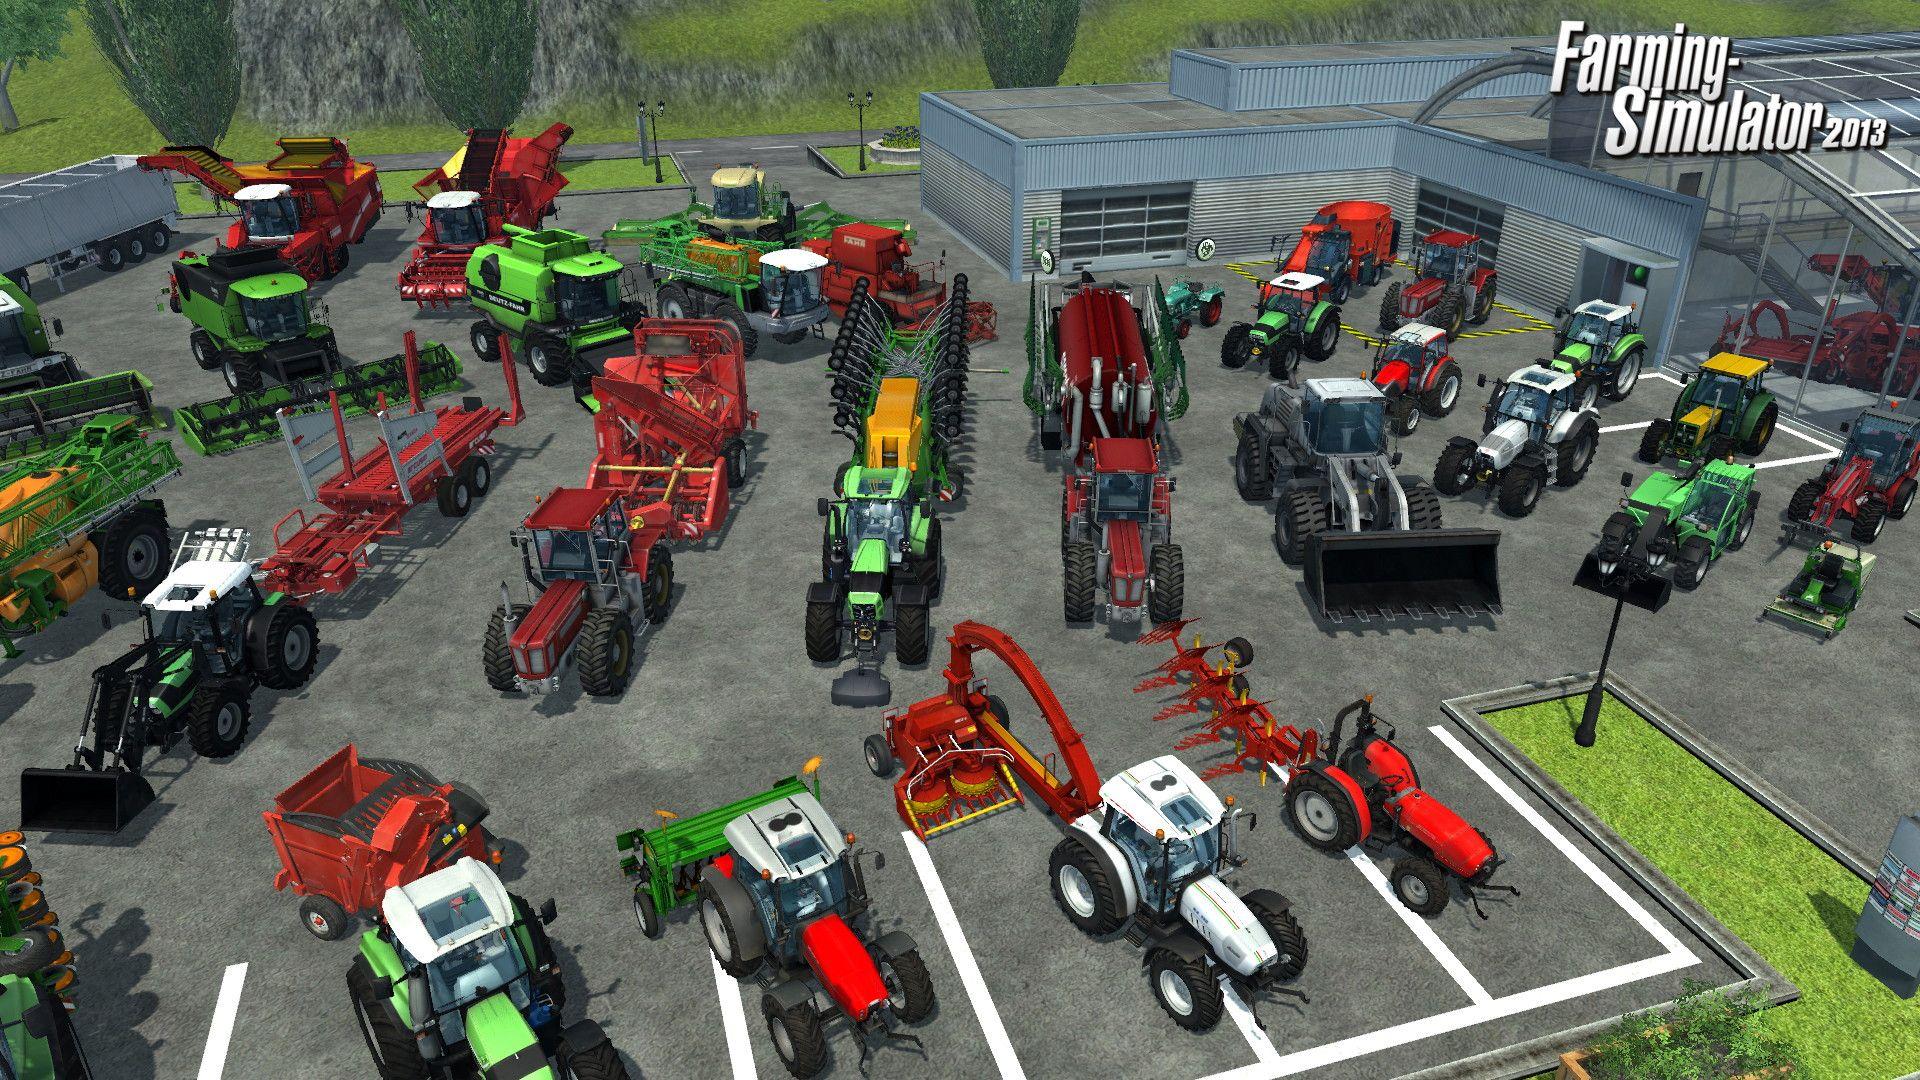 Farming simulator 2013 multiplayer crack working farming simulator 2013 multiplayer crack working as we all know